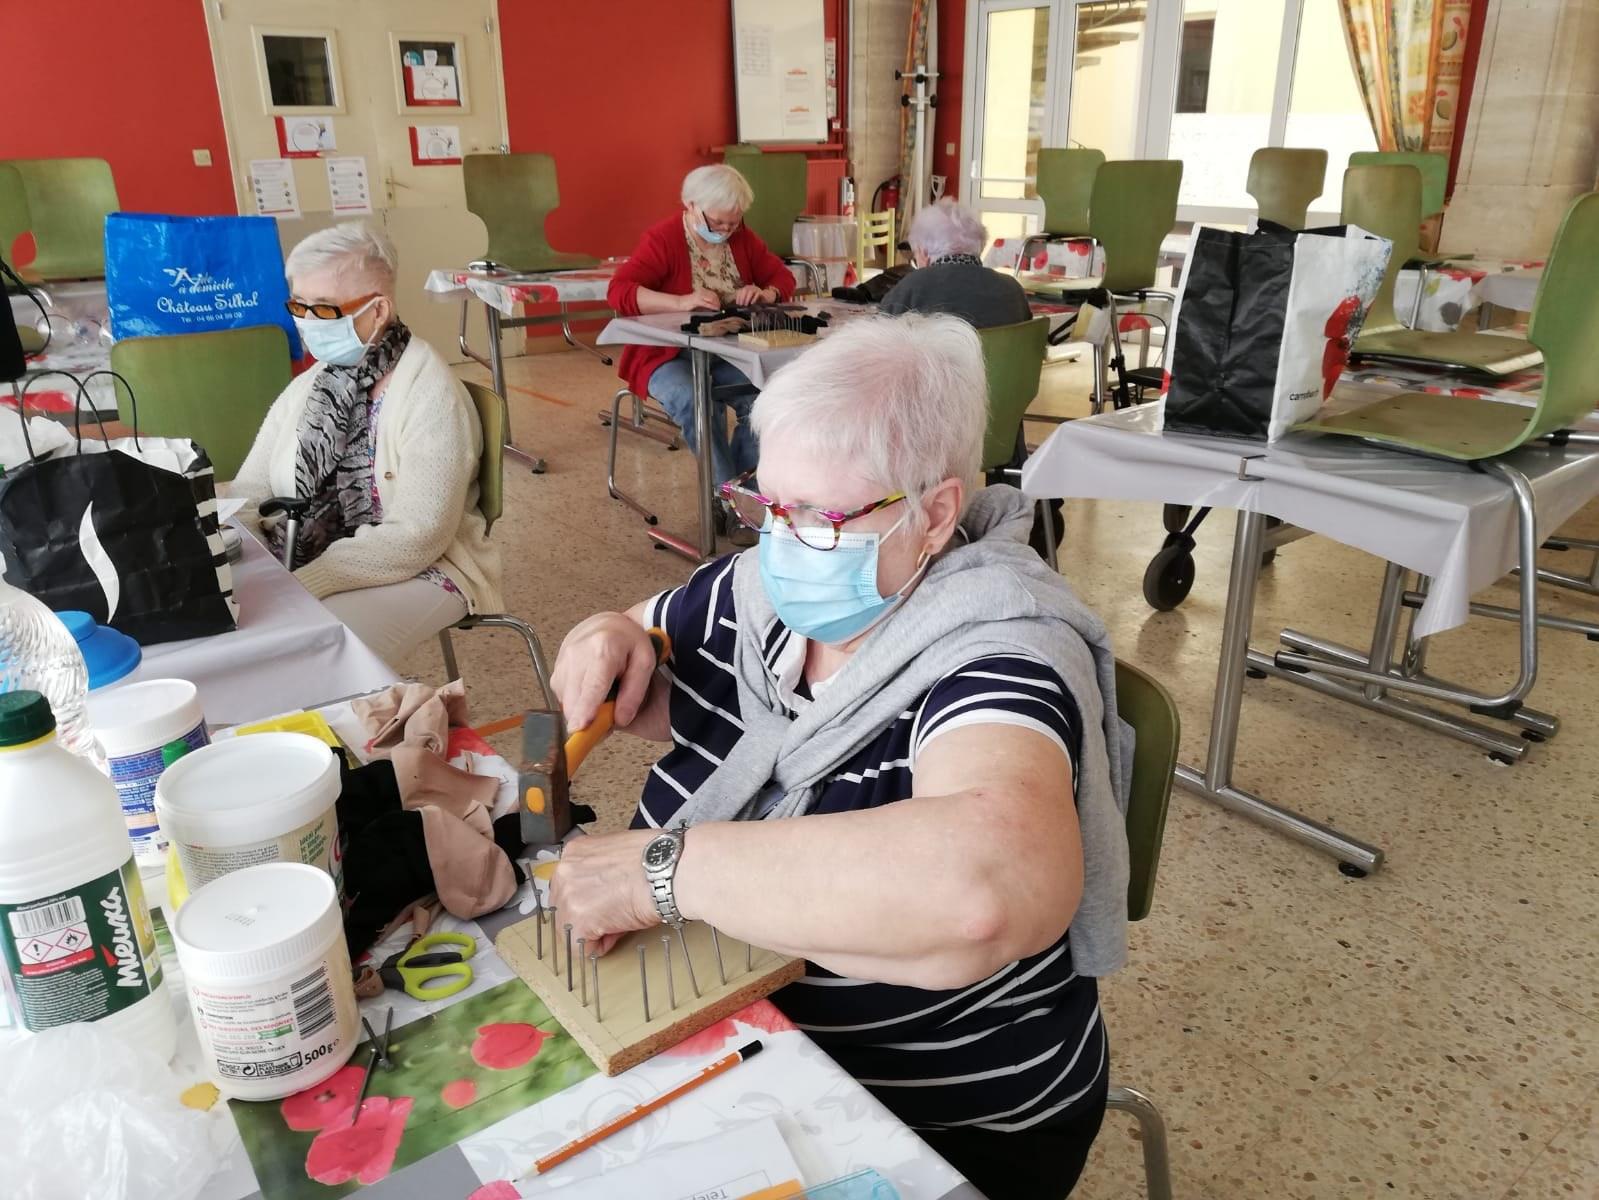 Atelier manuel - Entr'Aide Gardoise - Nîmes